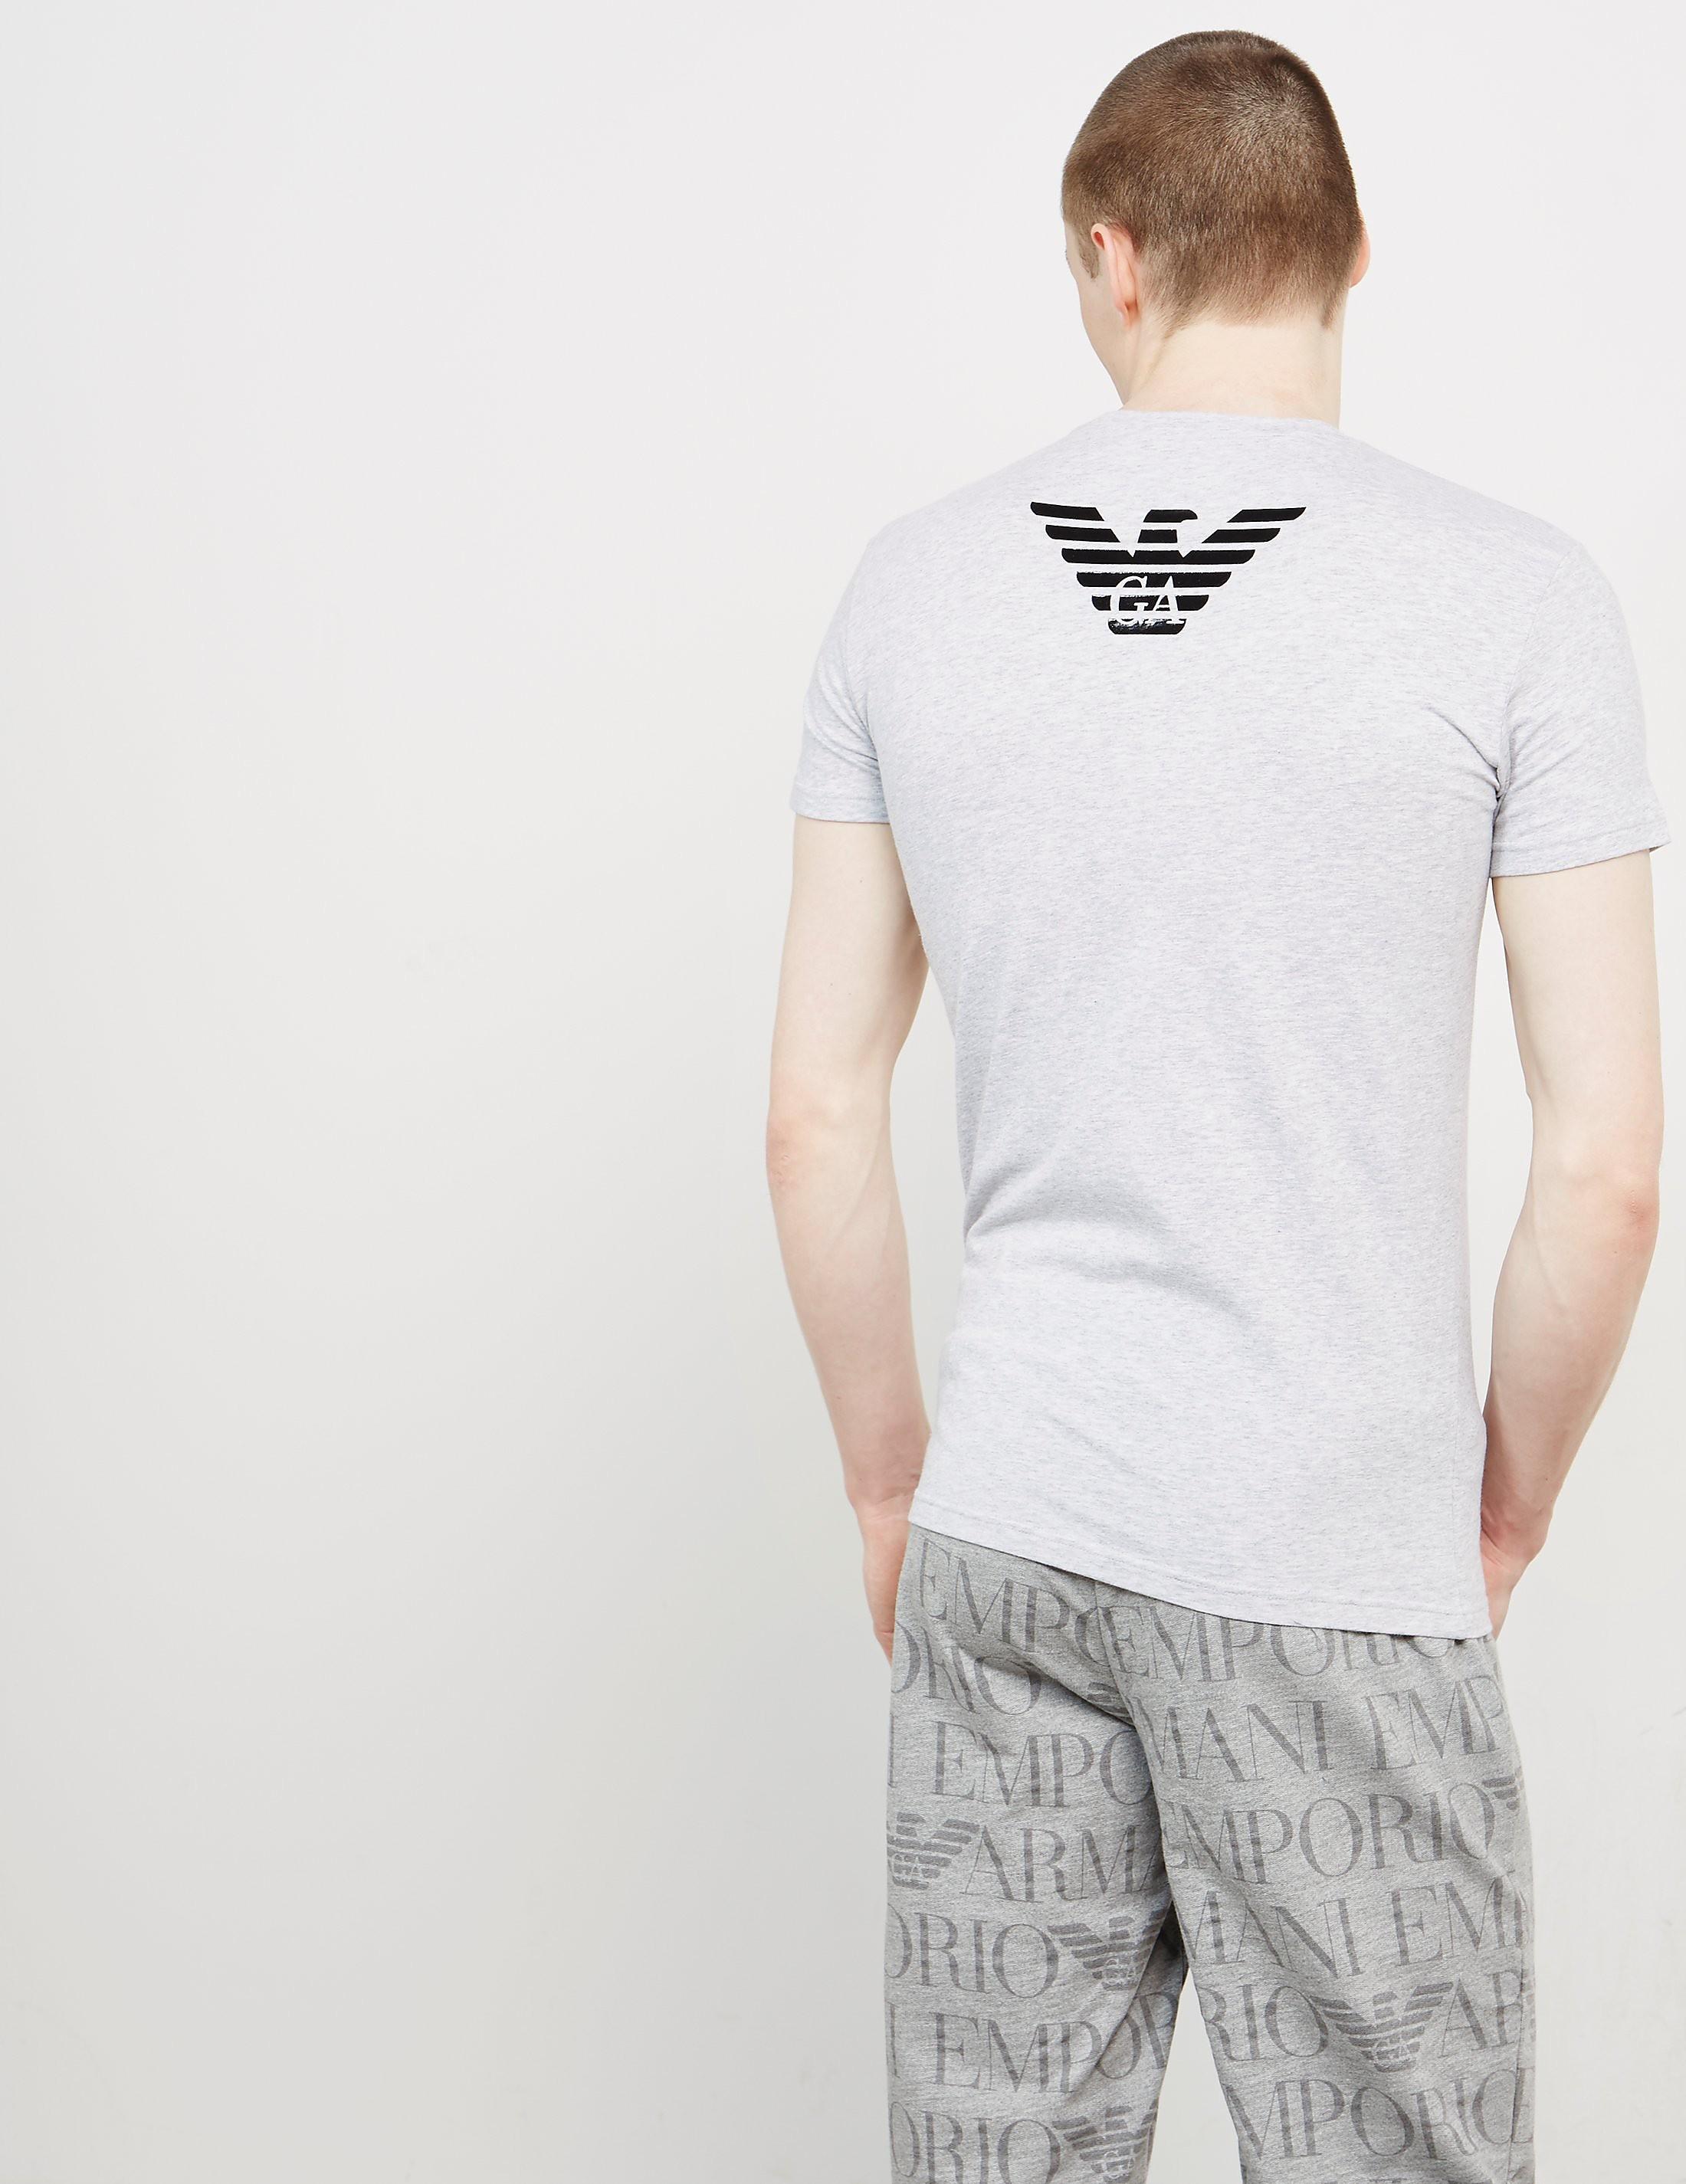 Emporio Armani Shiny Eagle Back Short Sleeve T-Shirt